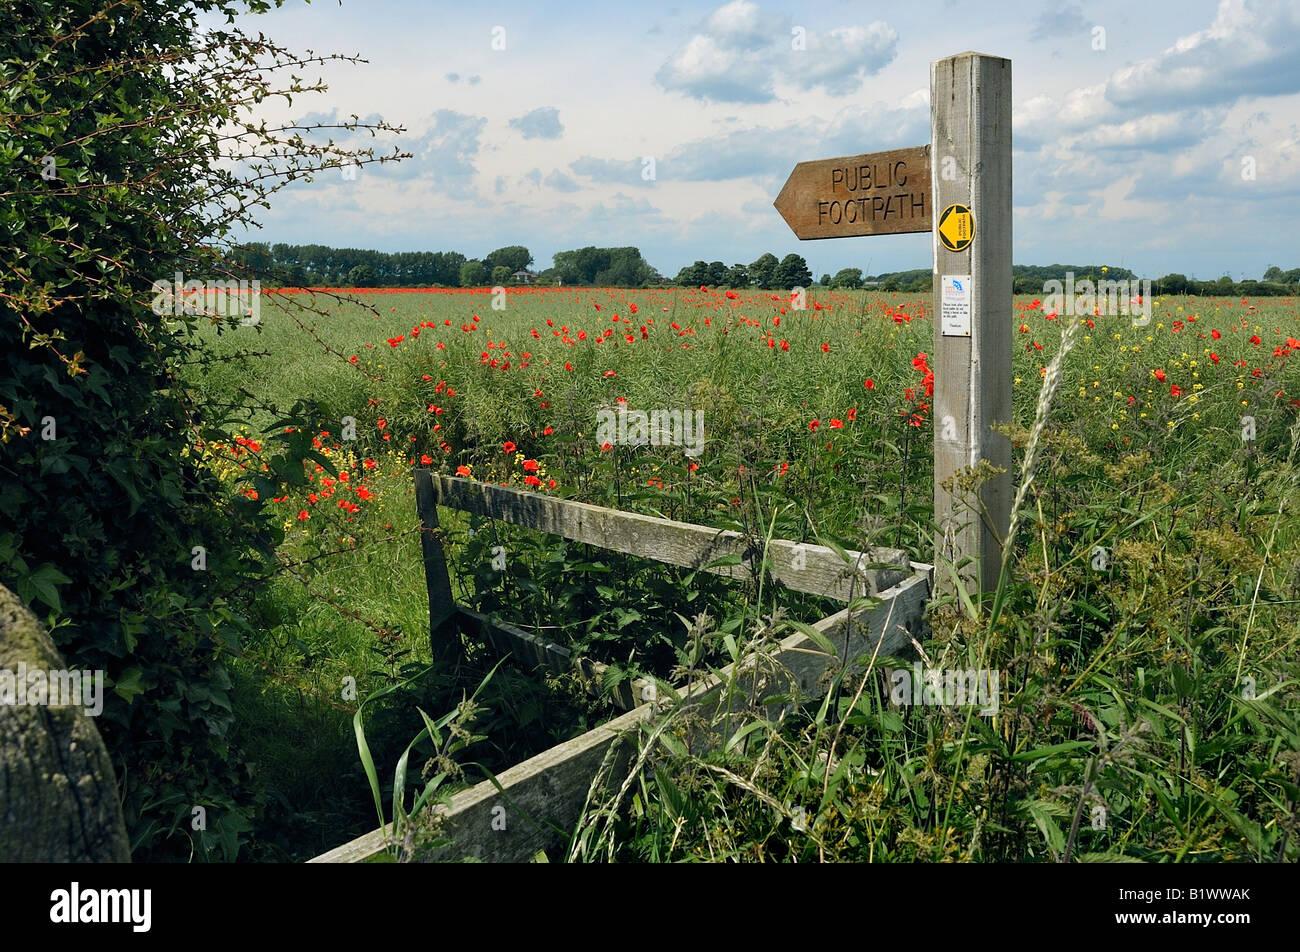 Public footpath - Stock Image